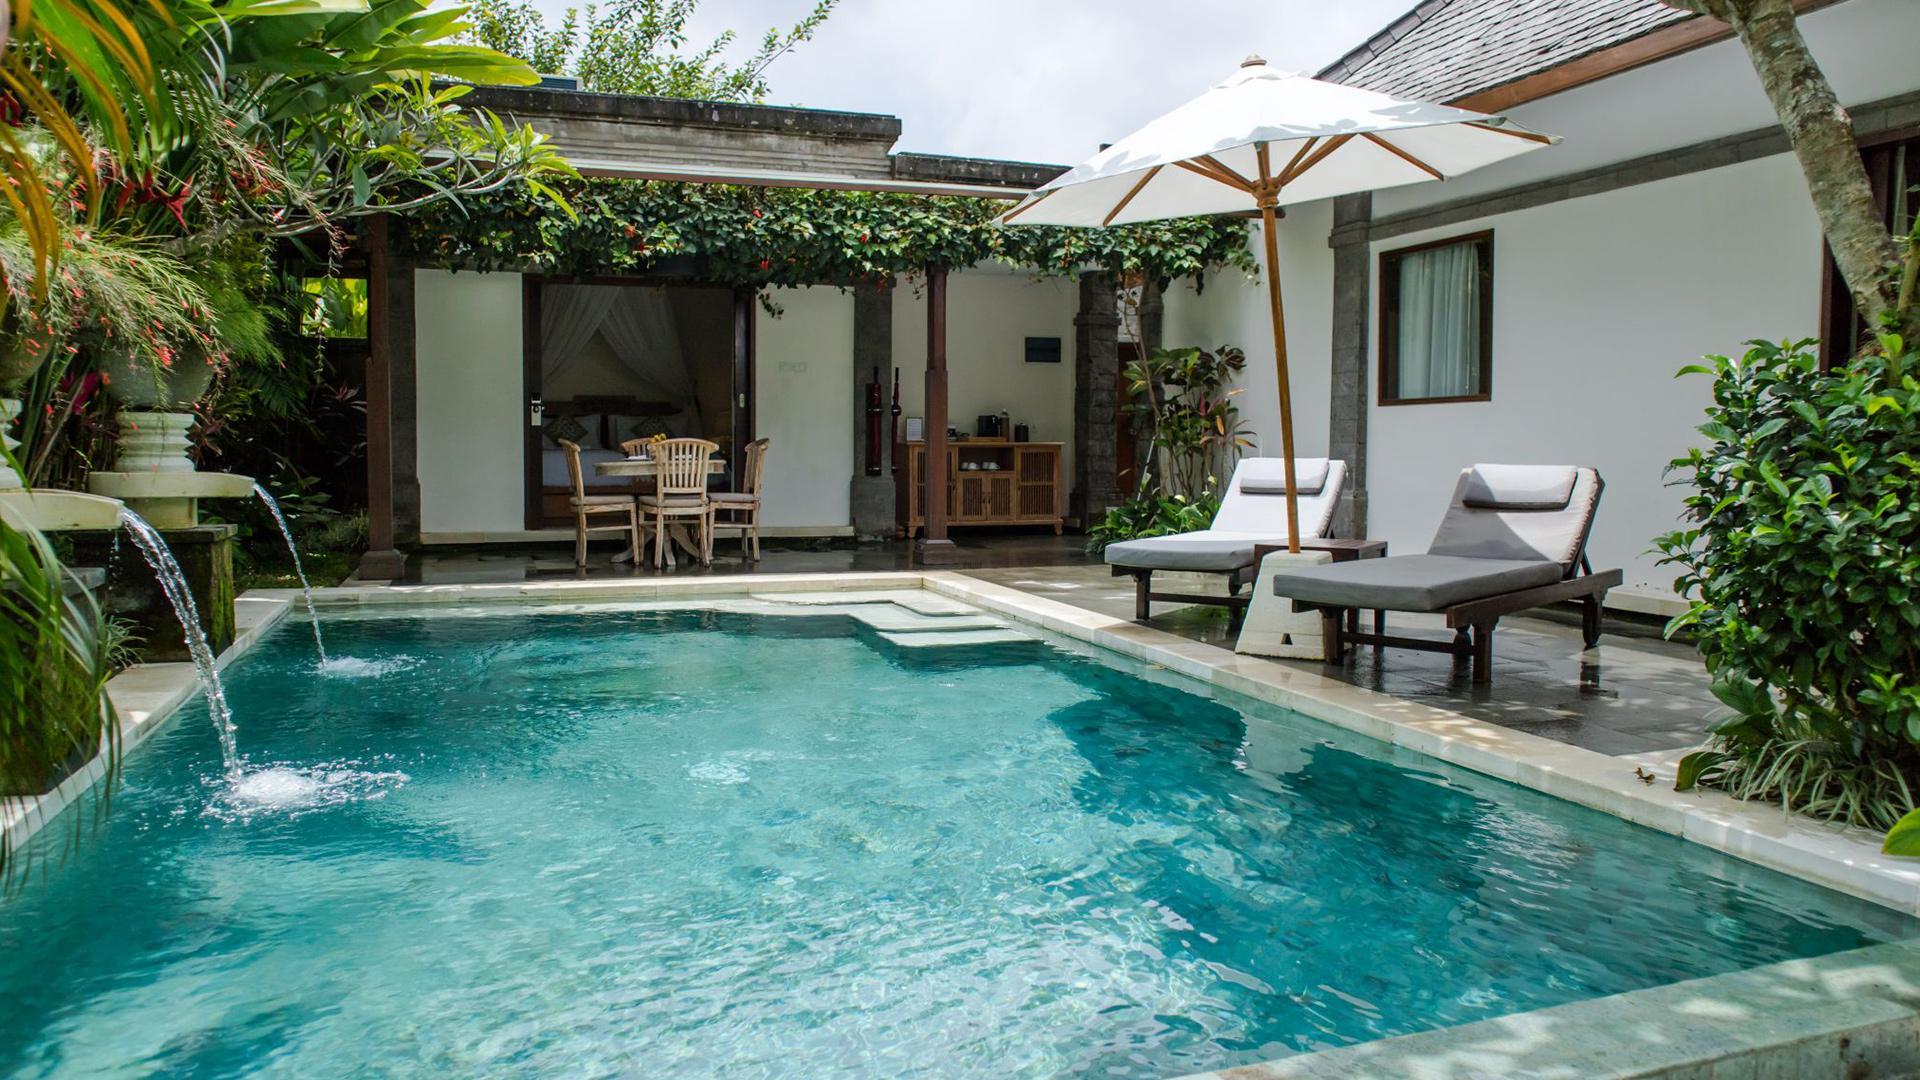 Two Bedroom Pool Villa image 1 at  Desa Visesa Ubud by Gianyar, Bali, Indonesia